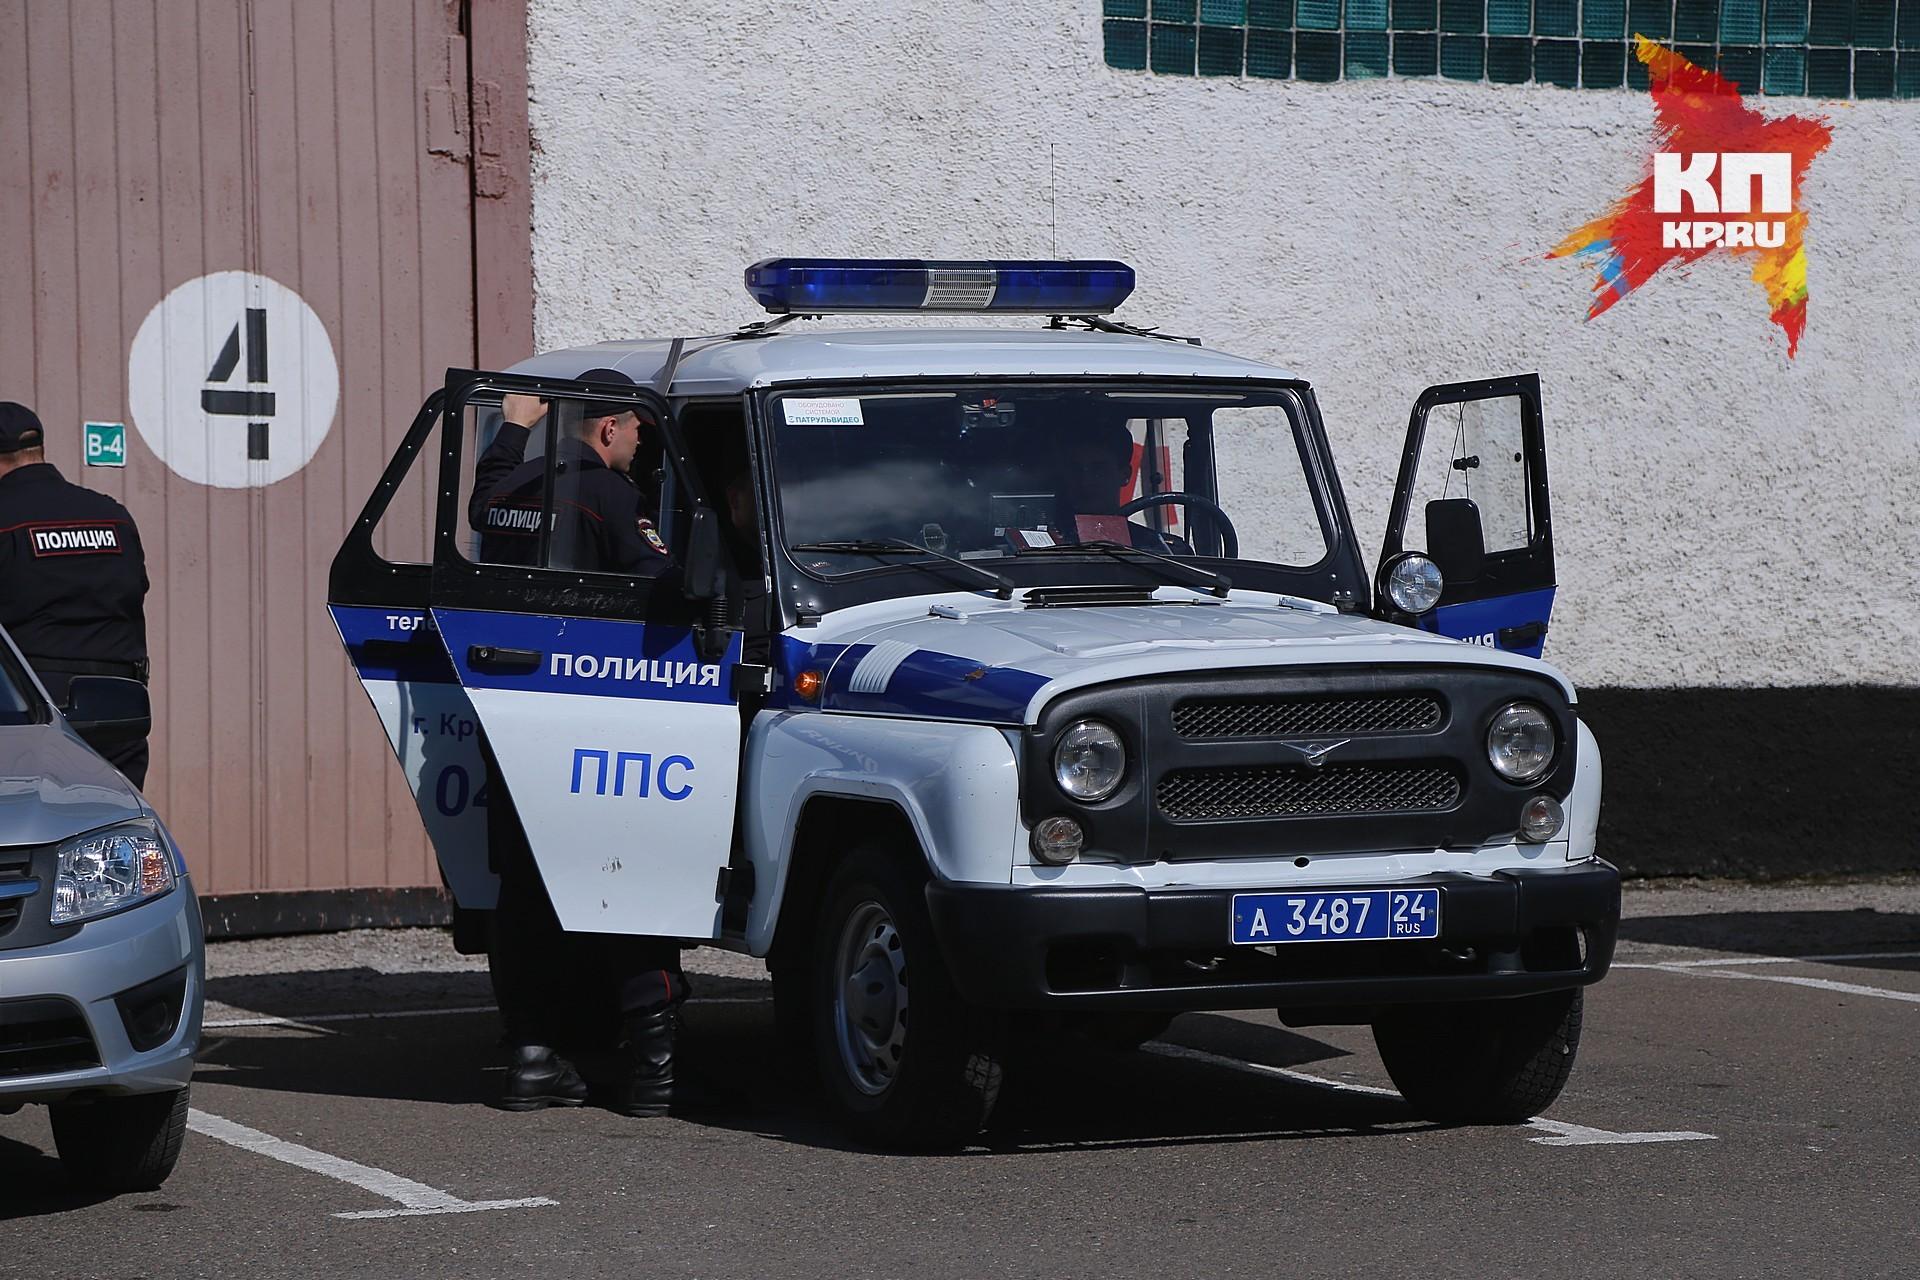 ВКрасноярском крае задержали подозреваемого вкраже бани